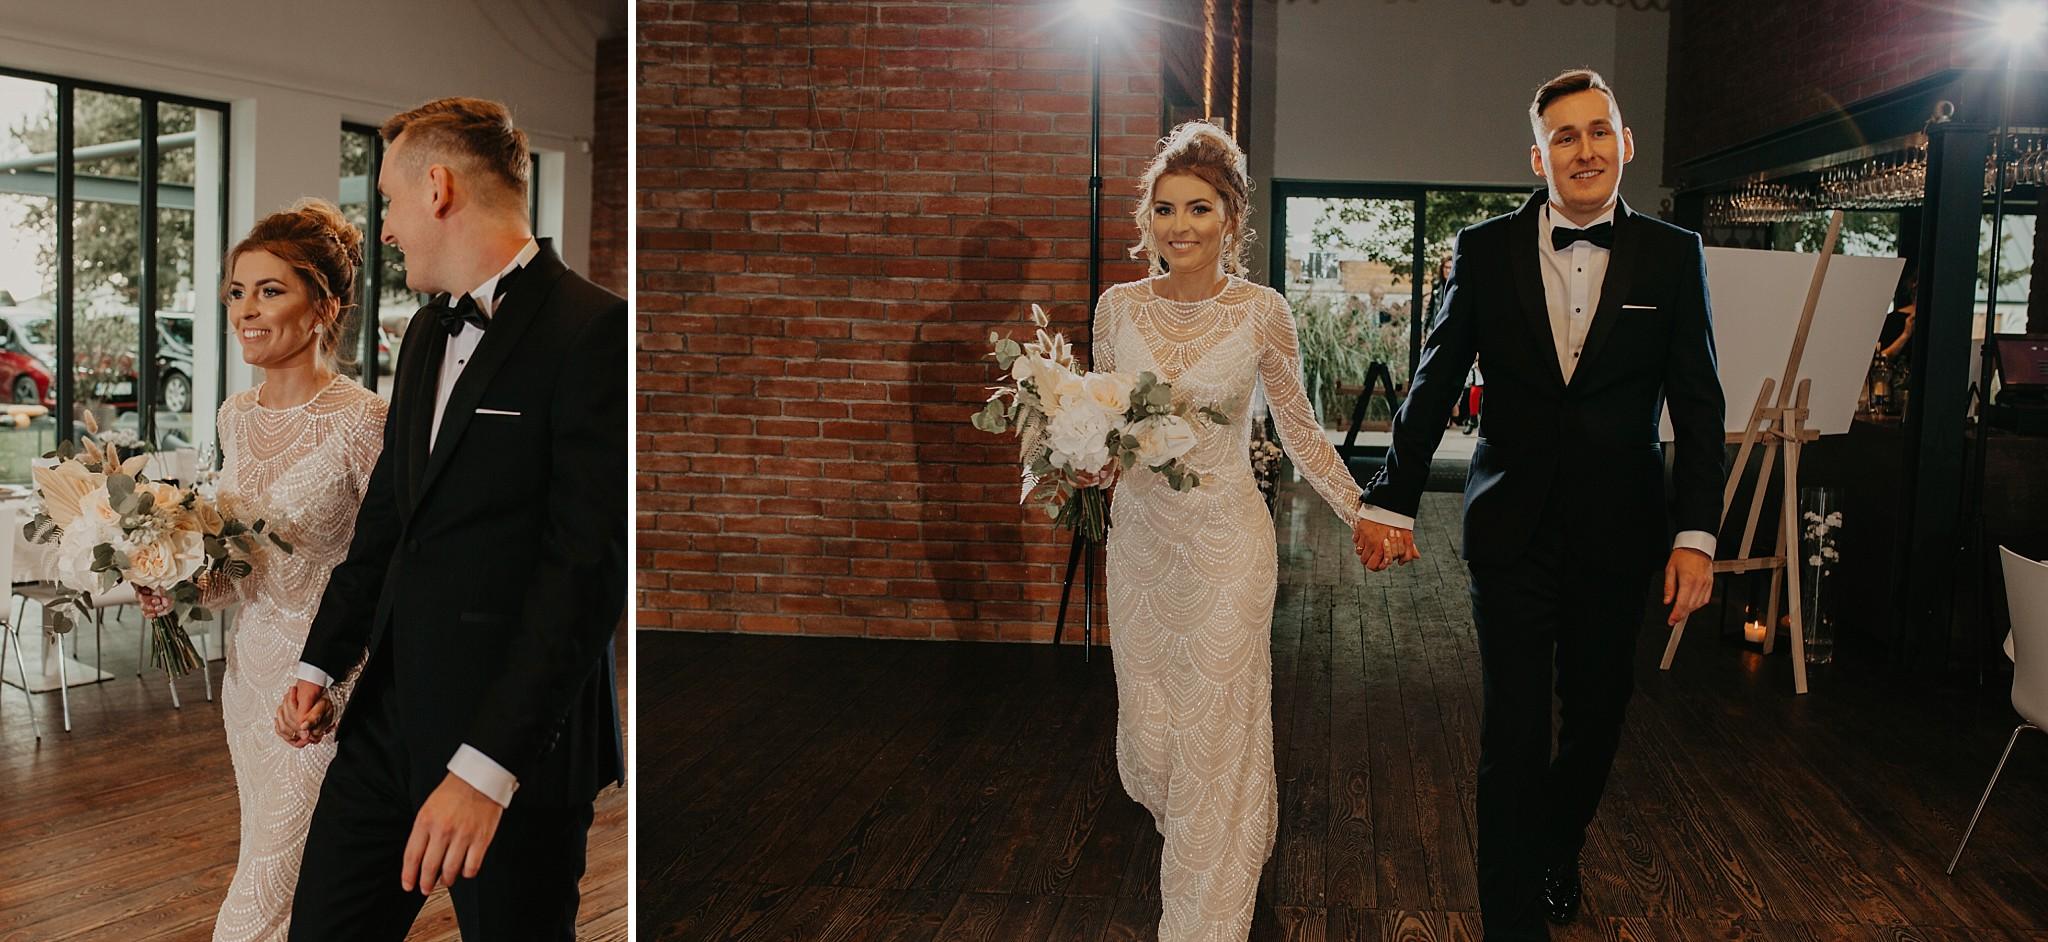 fotograf poznan wesele dobra truskawka piekne wesele pod poznaniem wesele w dobrej truskawce piekna para mloda slub marzen slub koronawirus slub listopad wesele koronawirus 270